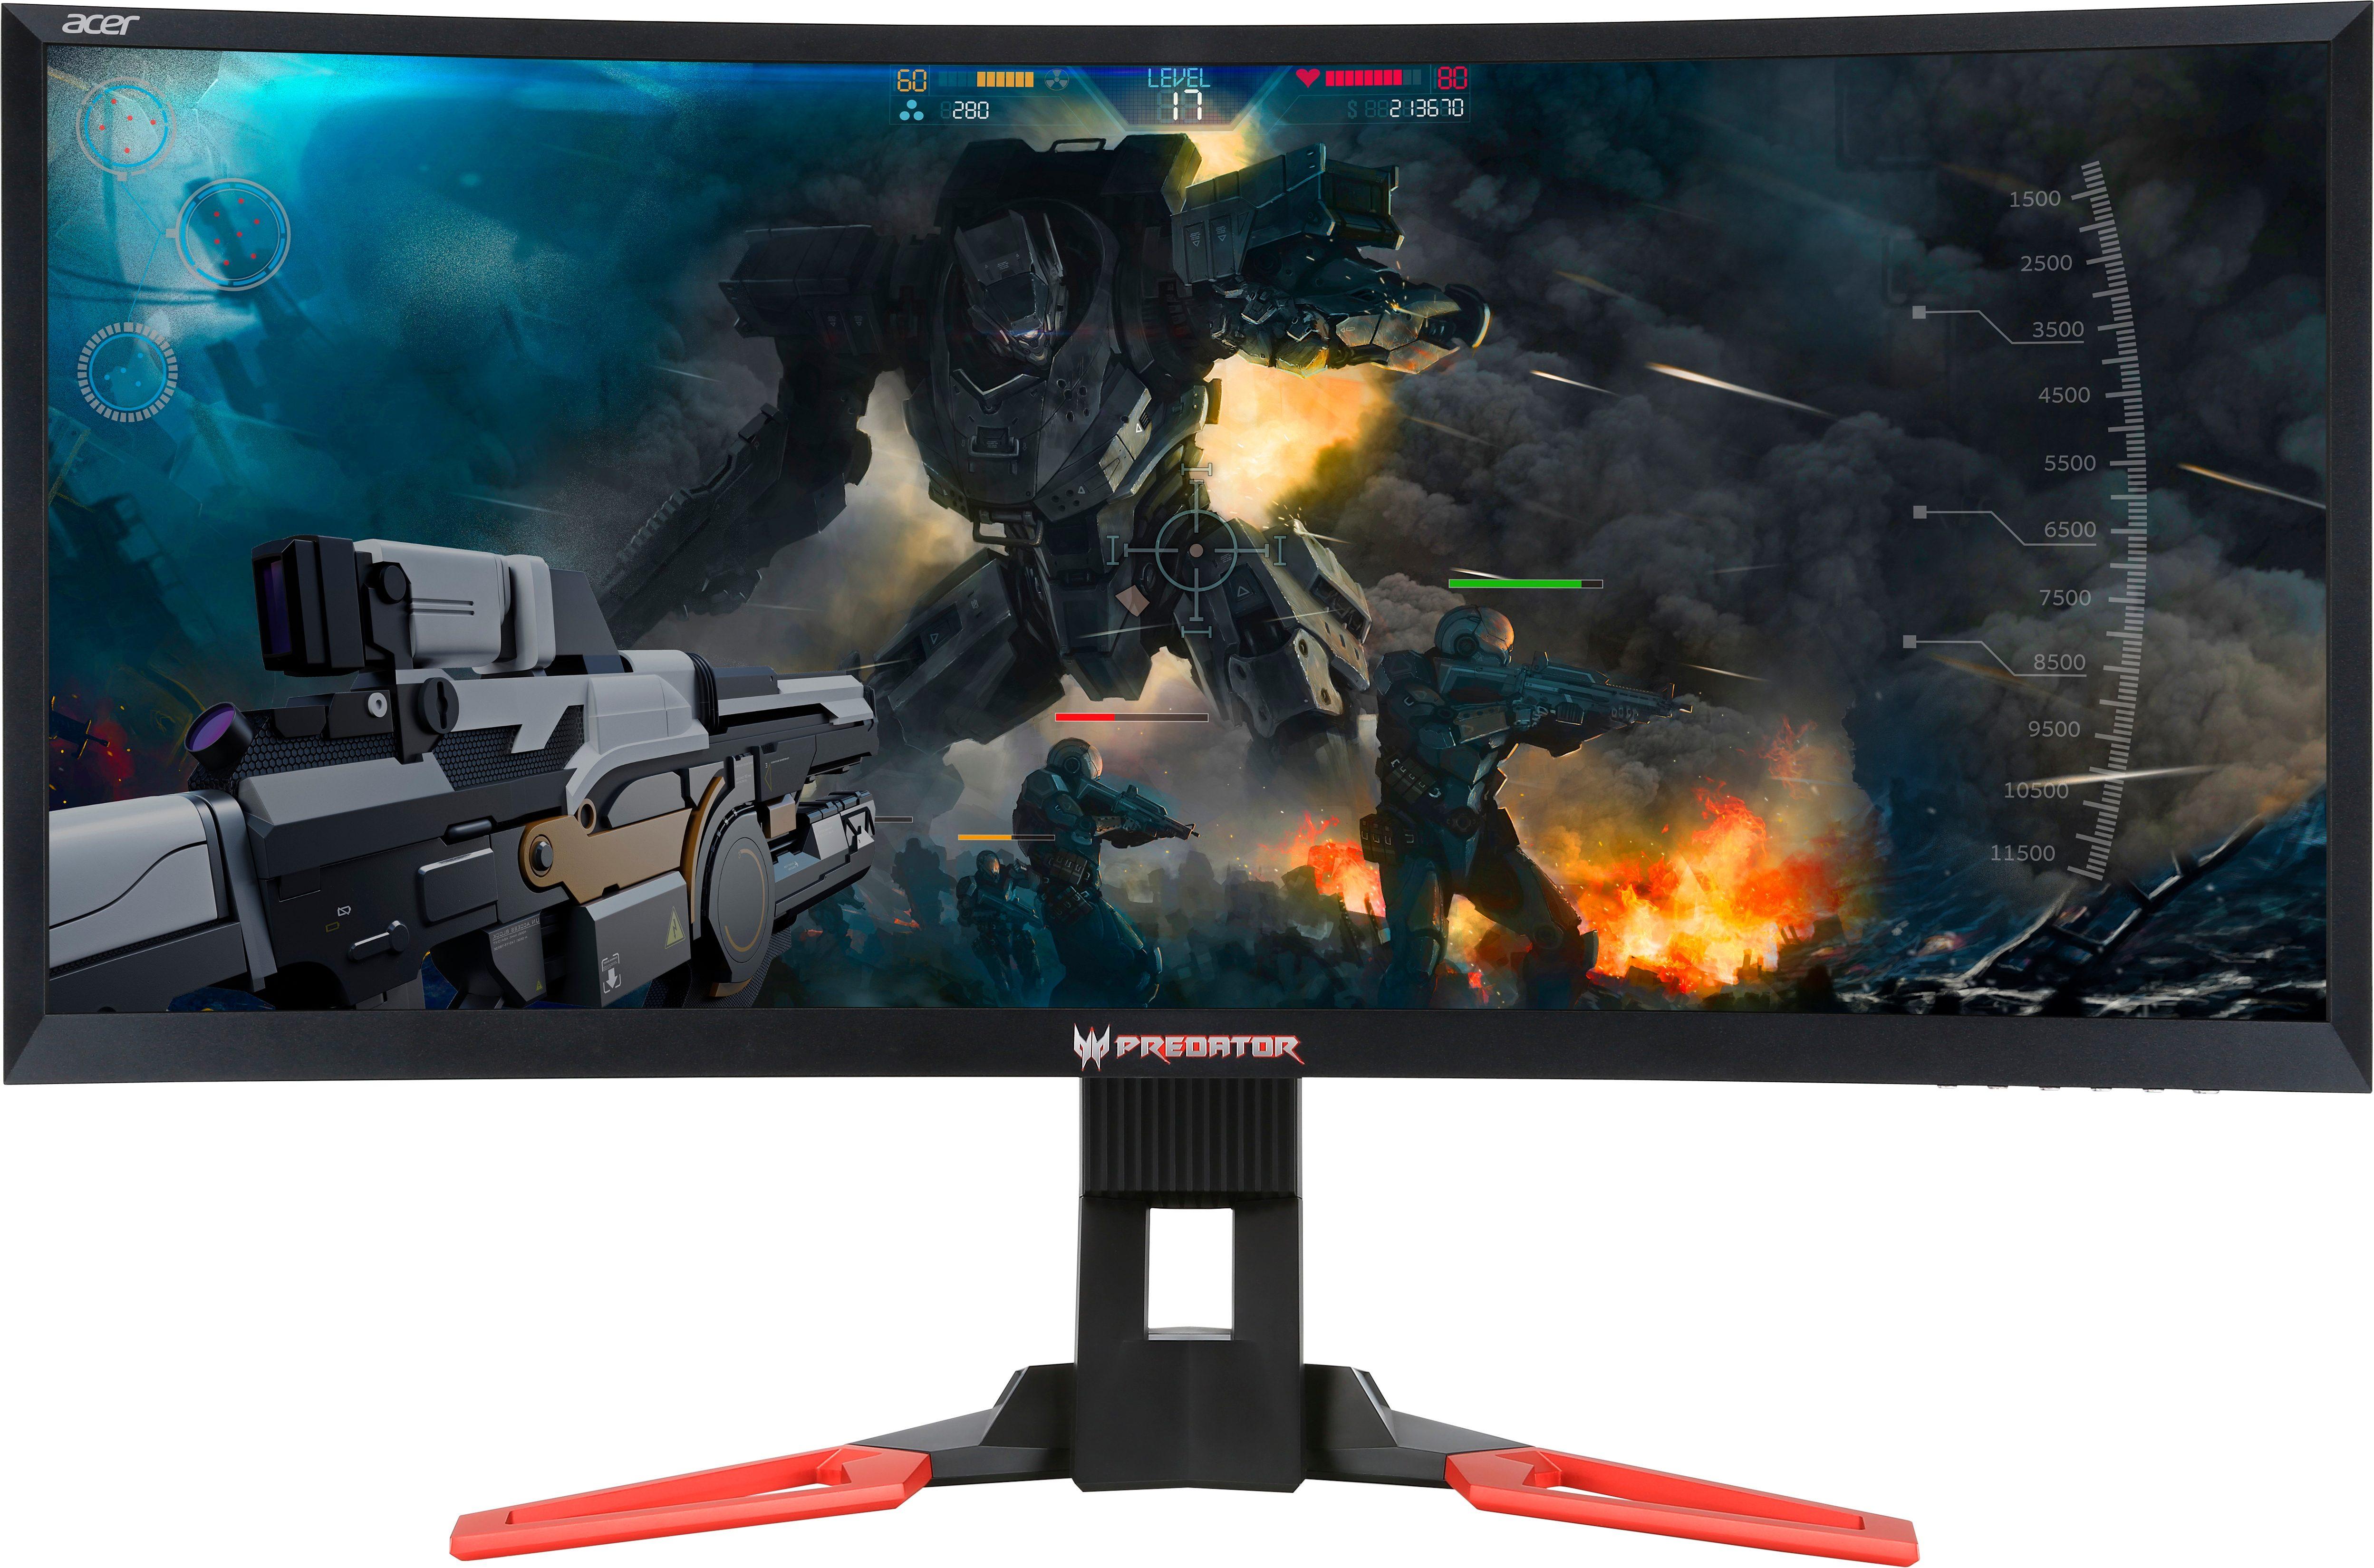 Acer Predator Z35 LCD-Monitor, 89 cm (35 Zoll), 2560 x 1080, 21:9